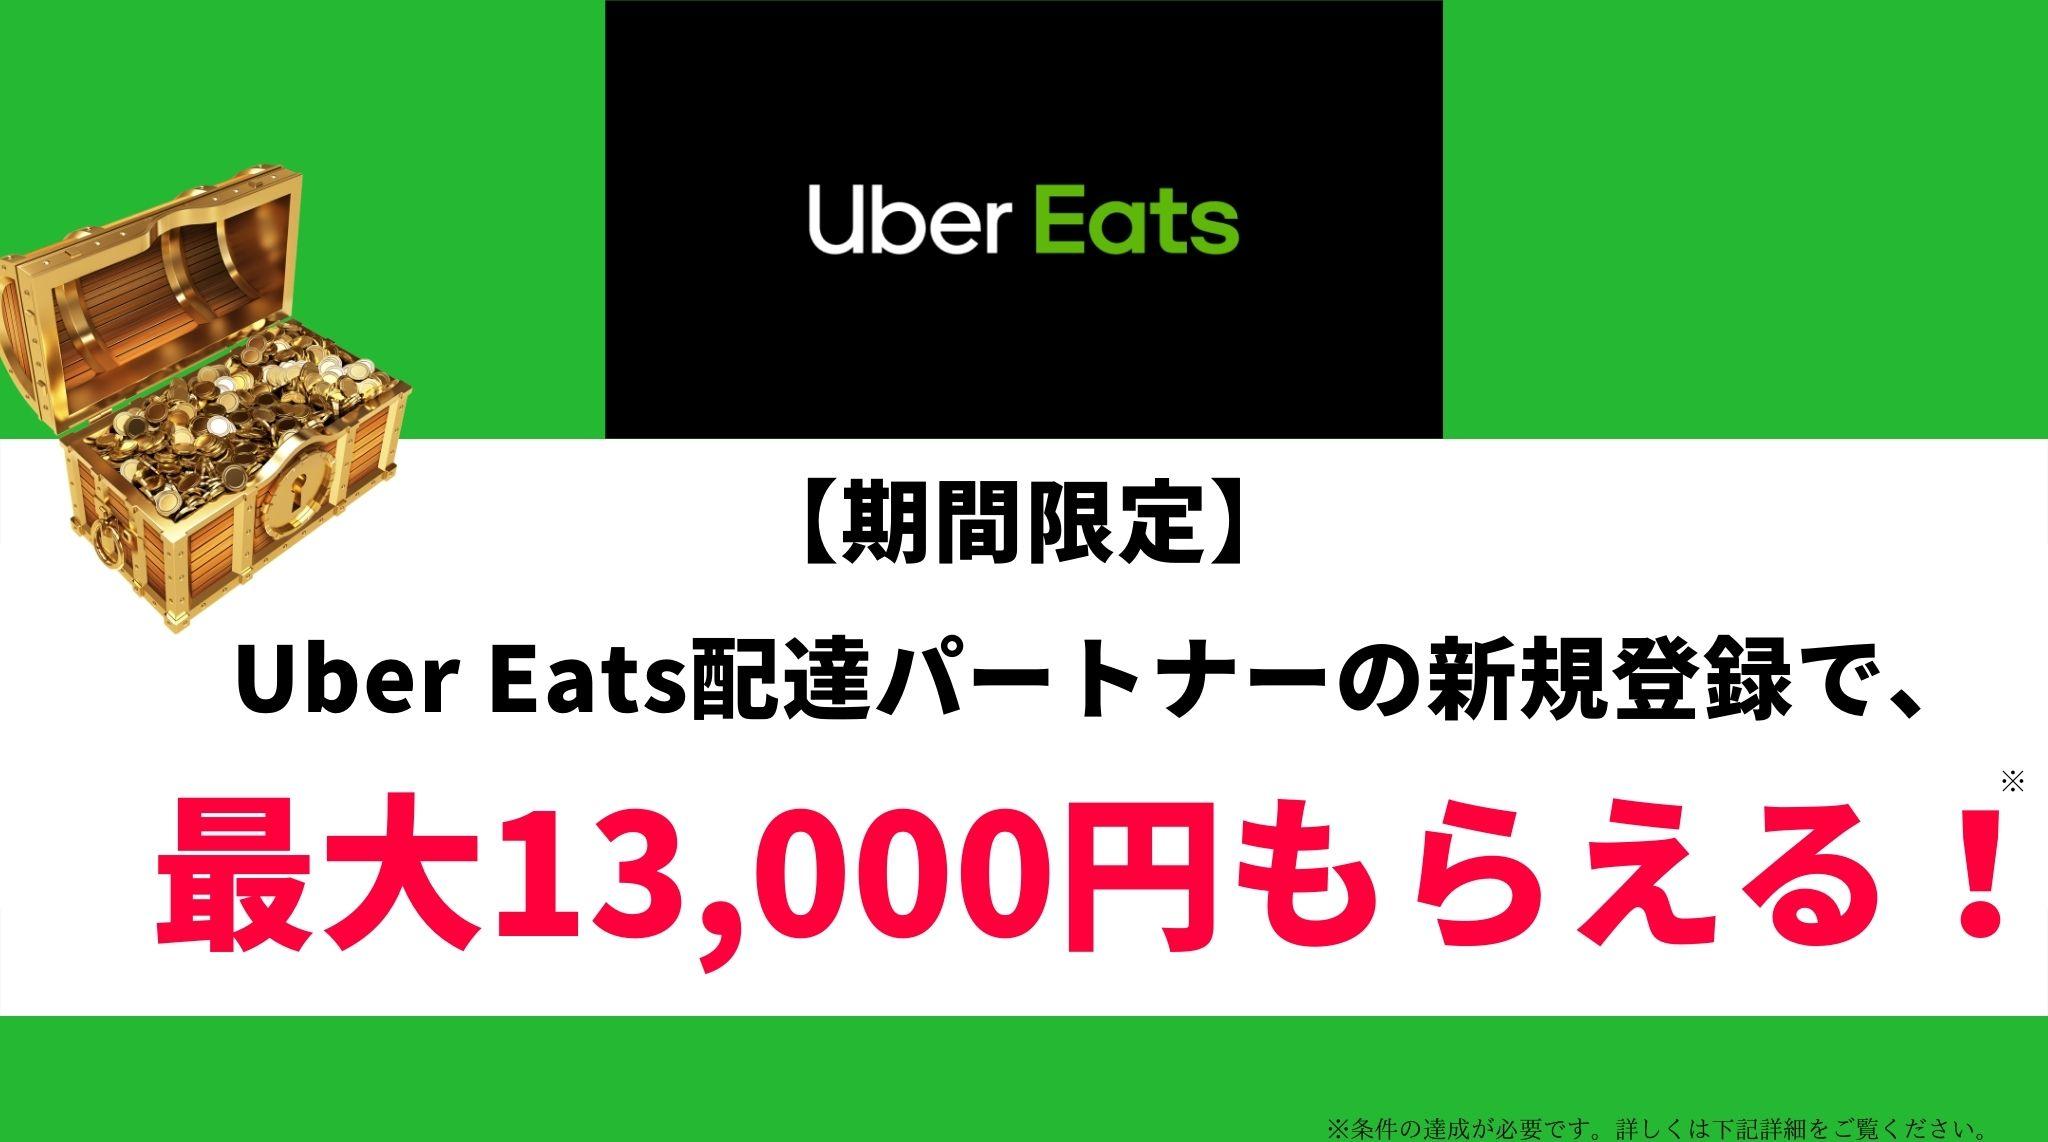 Uber Eats13000円キャッシュバック